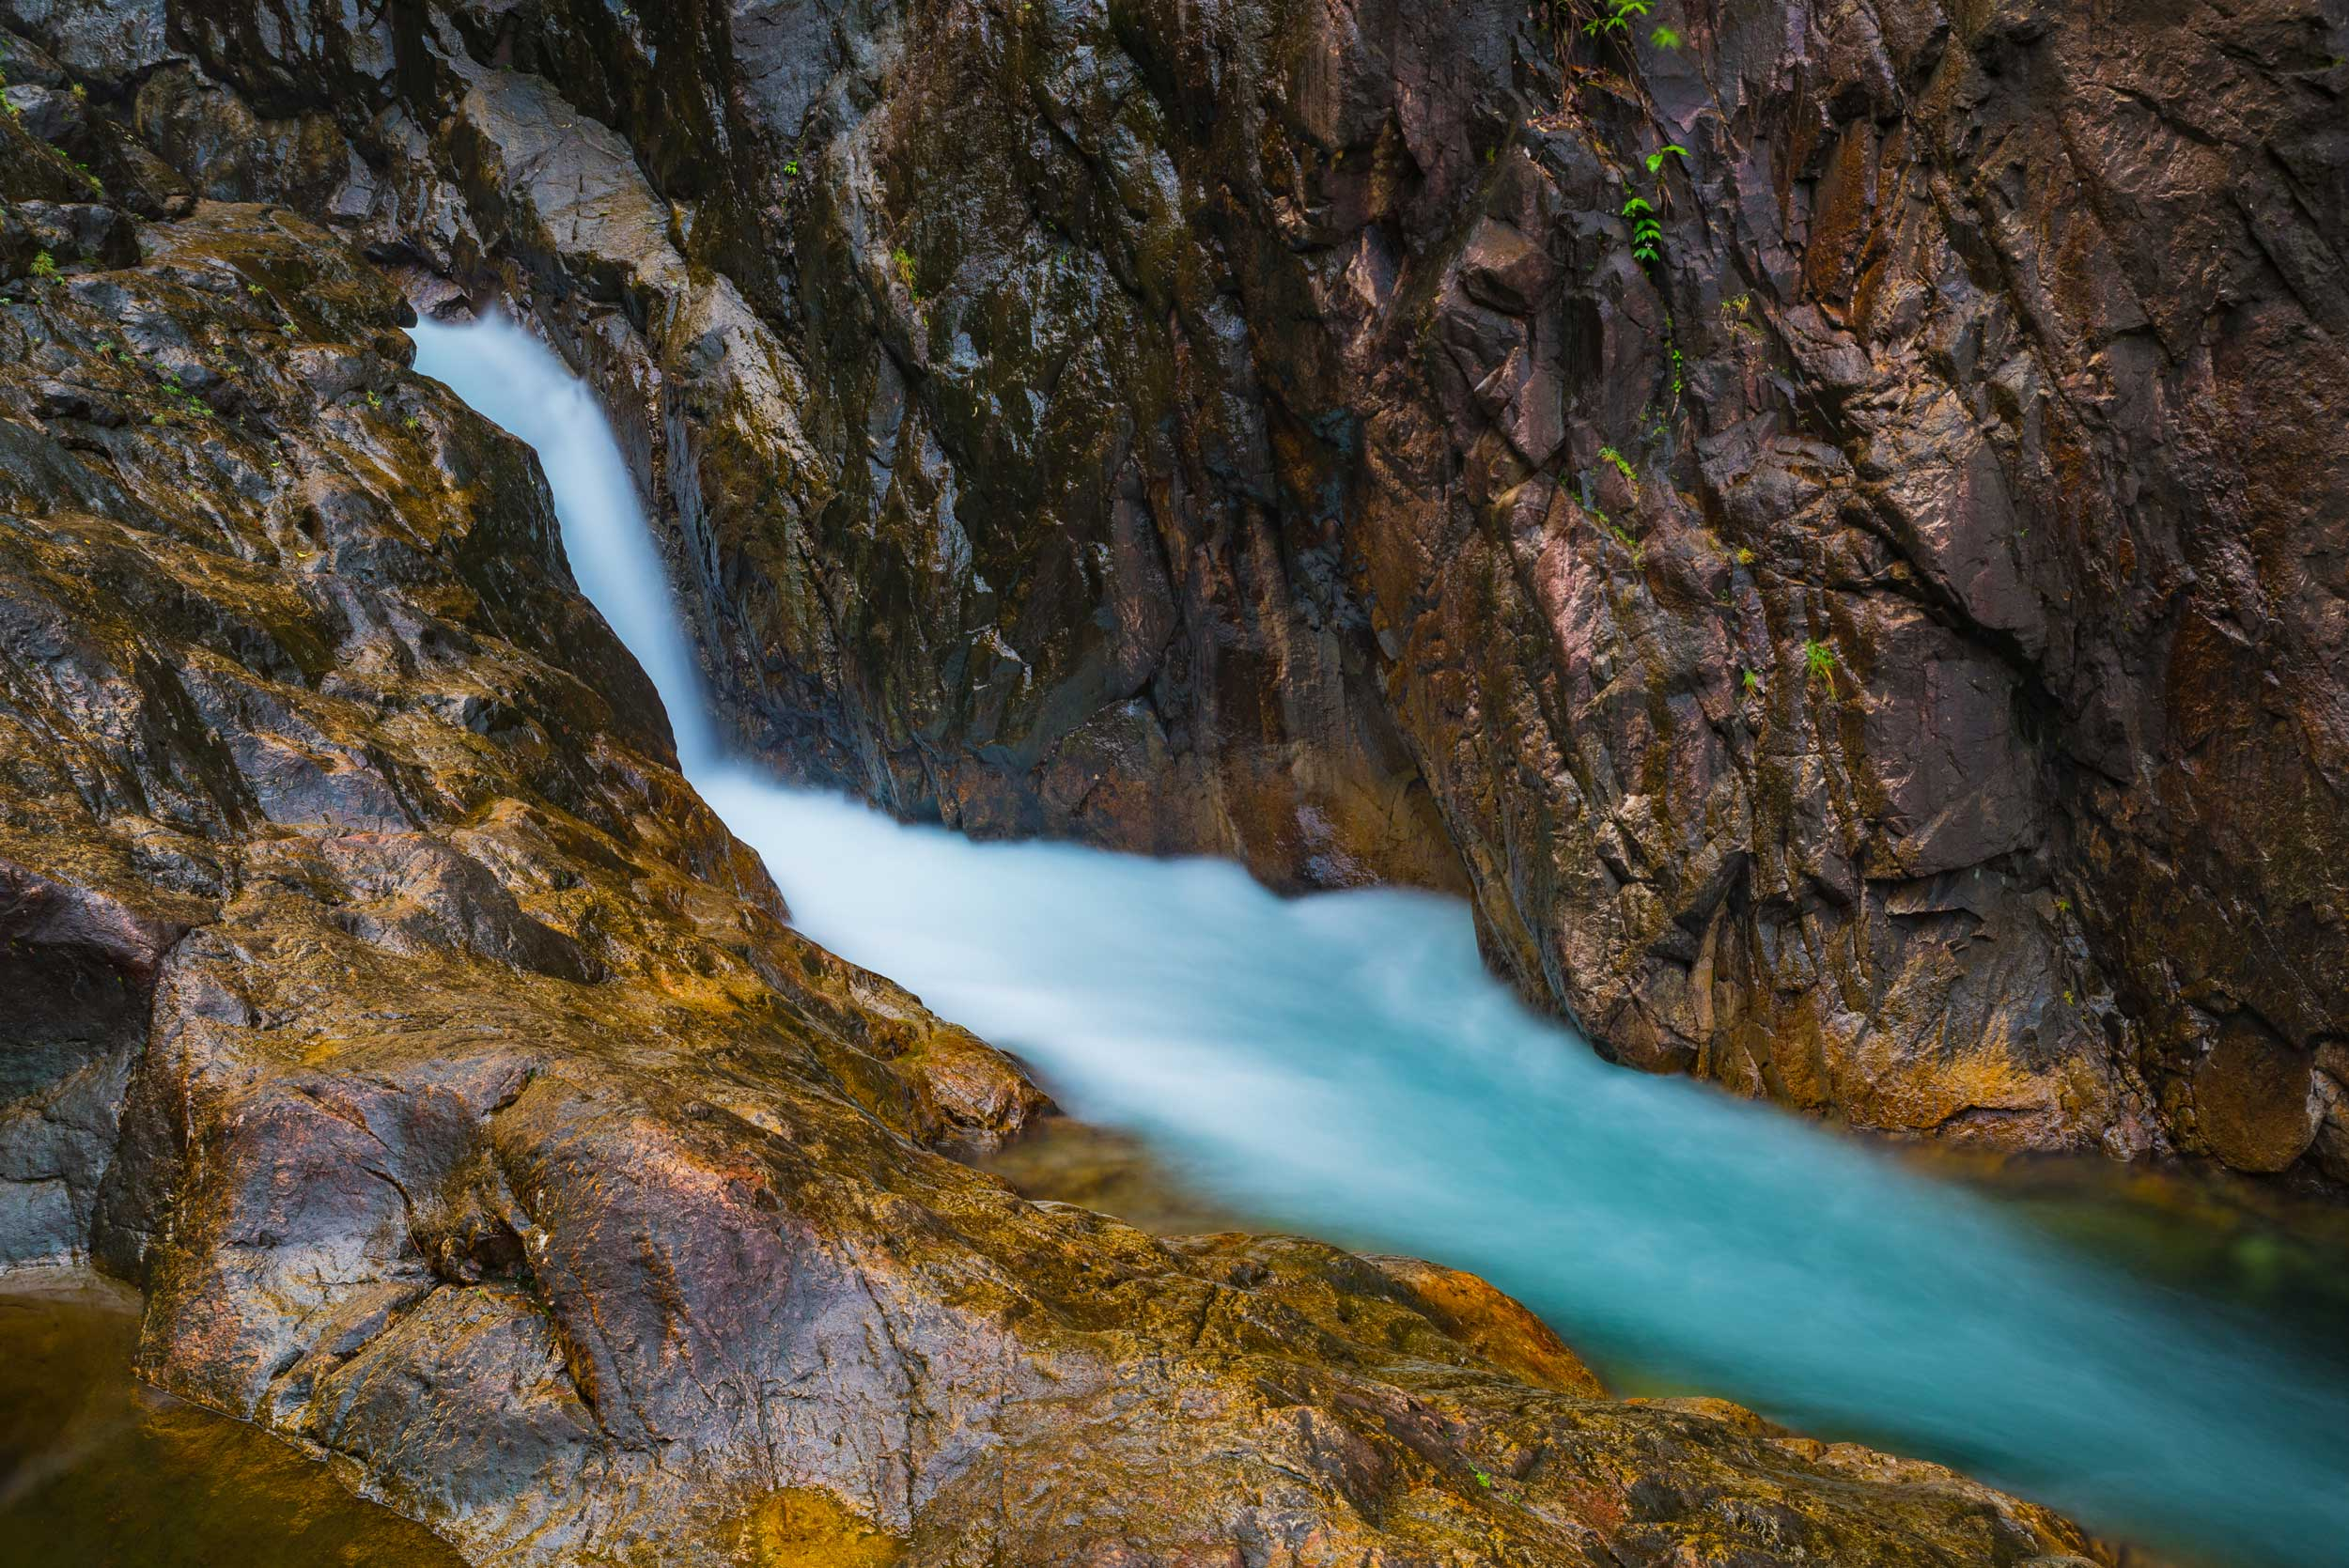 Koh Chang Waterfall